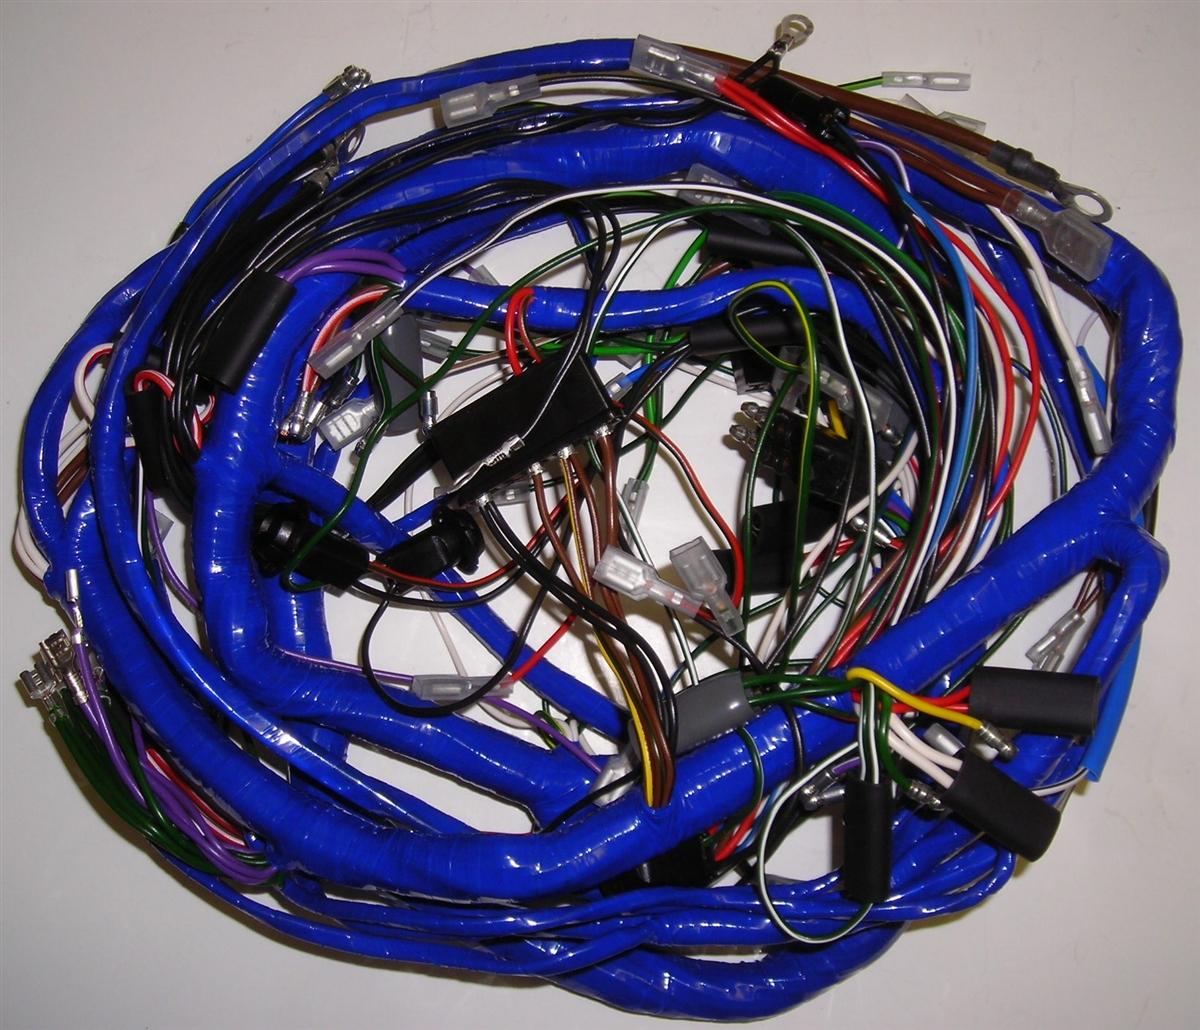 Mgb Wiring Harness Diagram Will Be A Thing 1999 Silverado Routing 1967 68 Main Dash 505 Rh Britishwiring Com